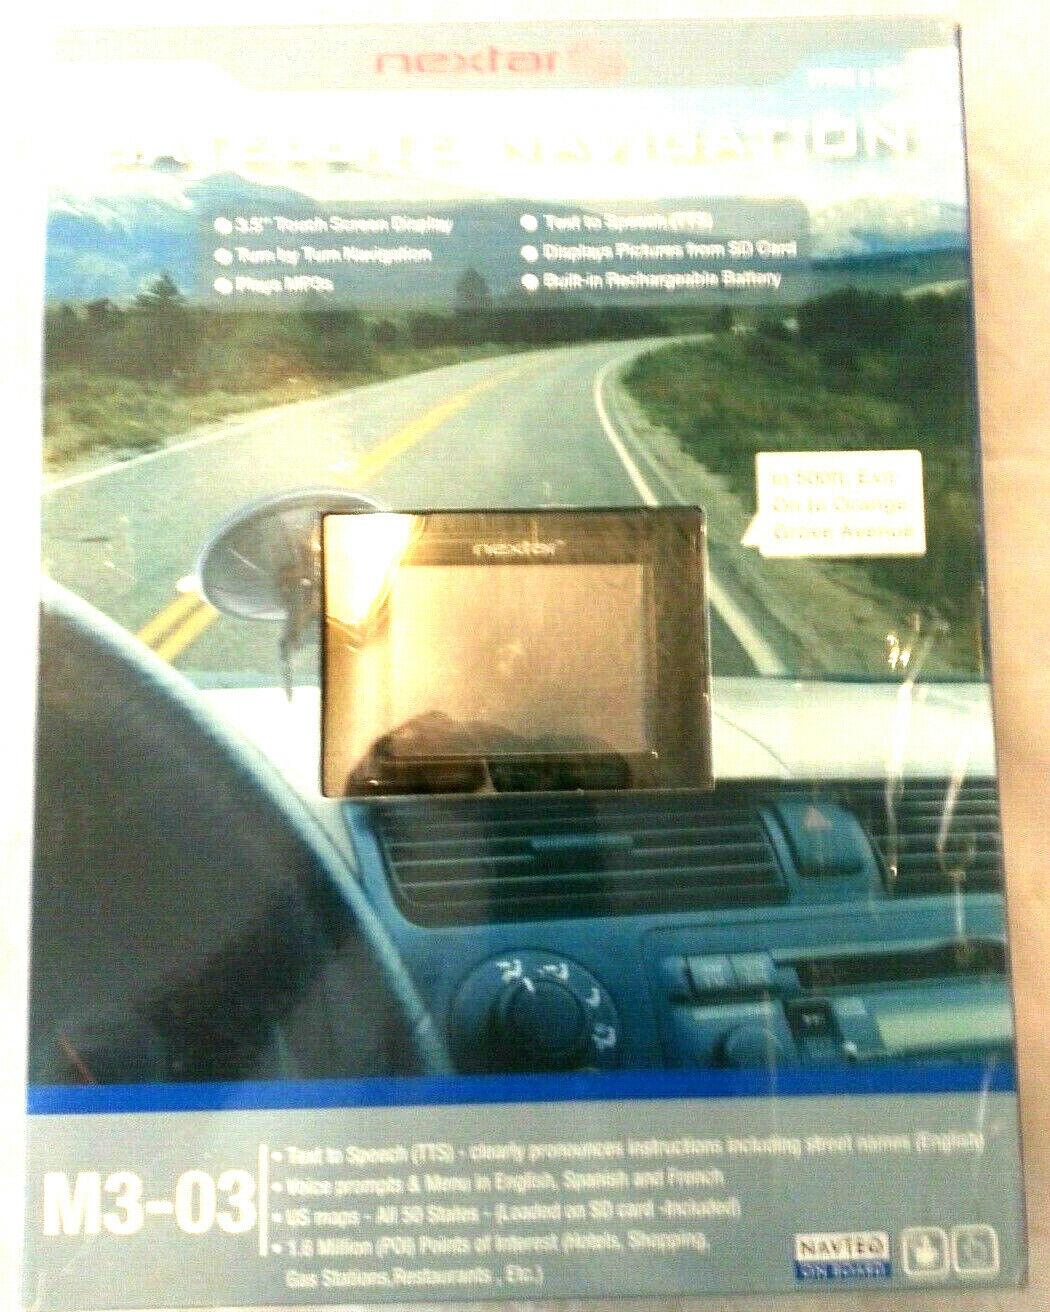 Nextar M3-03 gps Navigation System  In Box